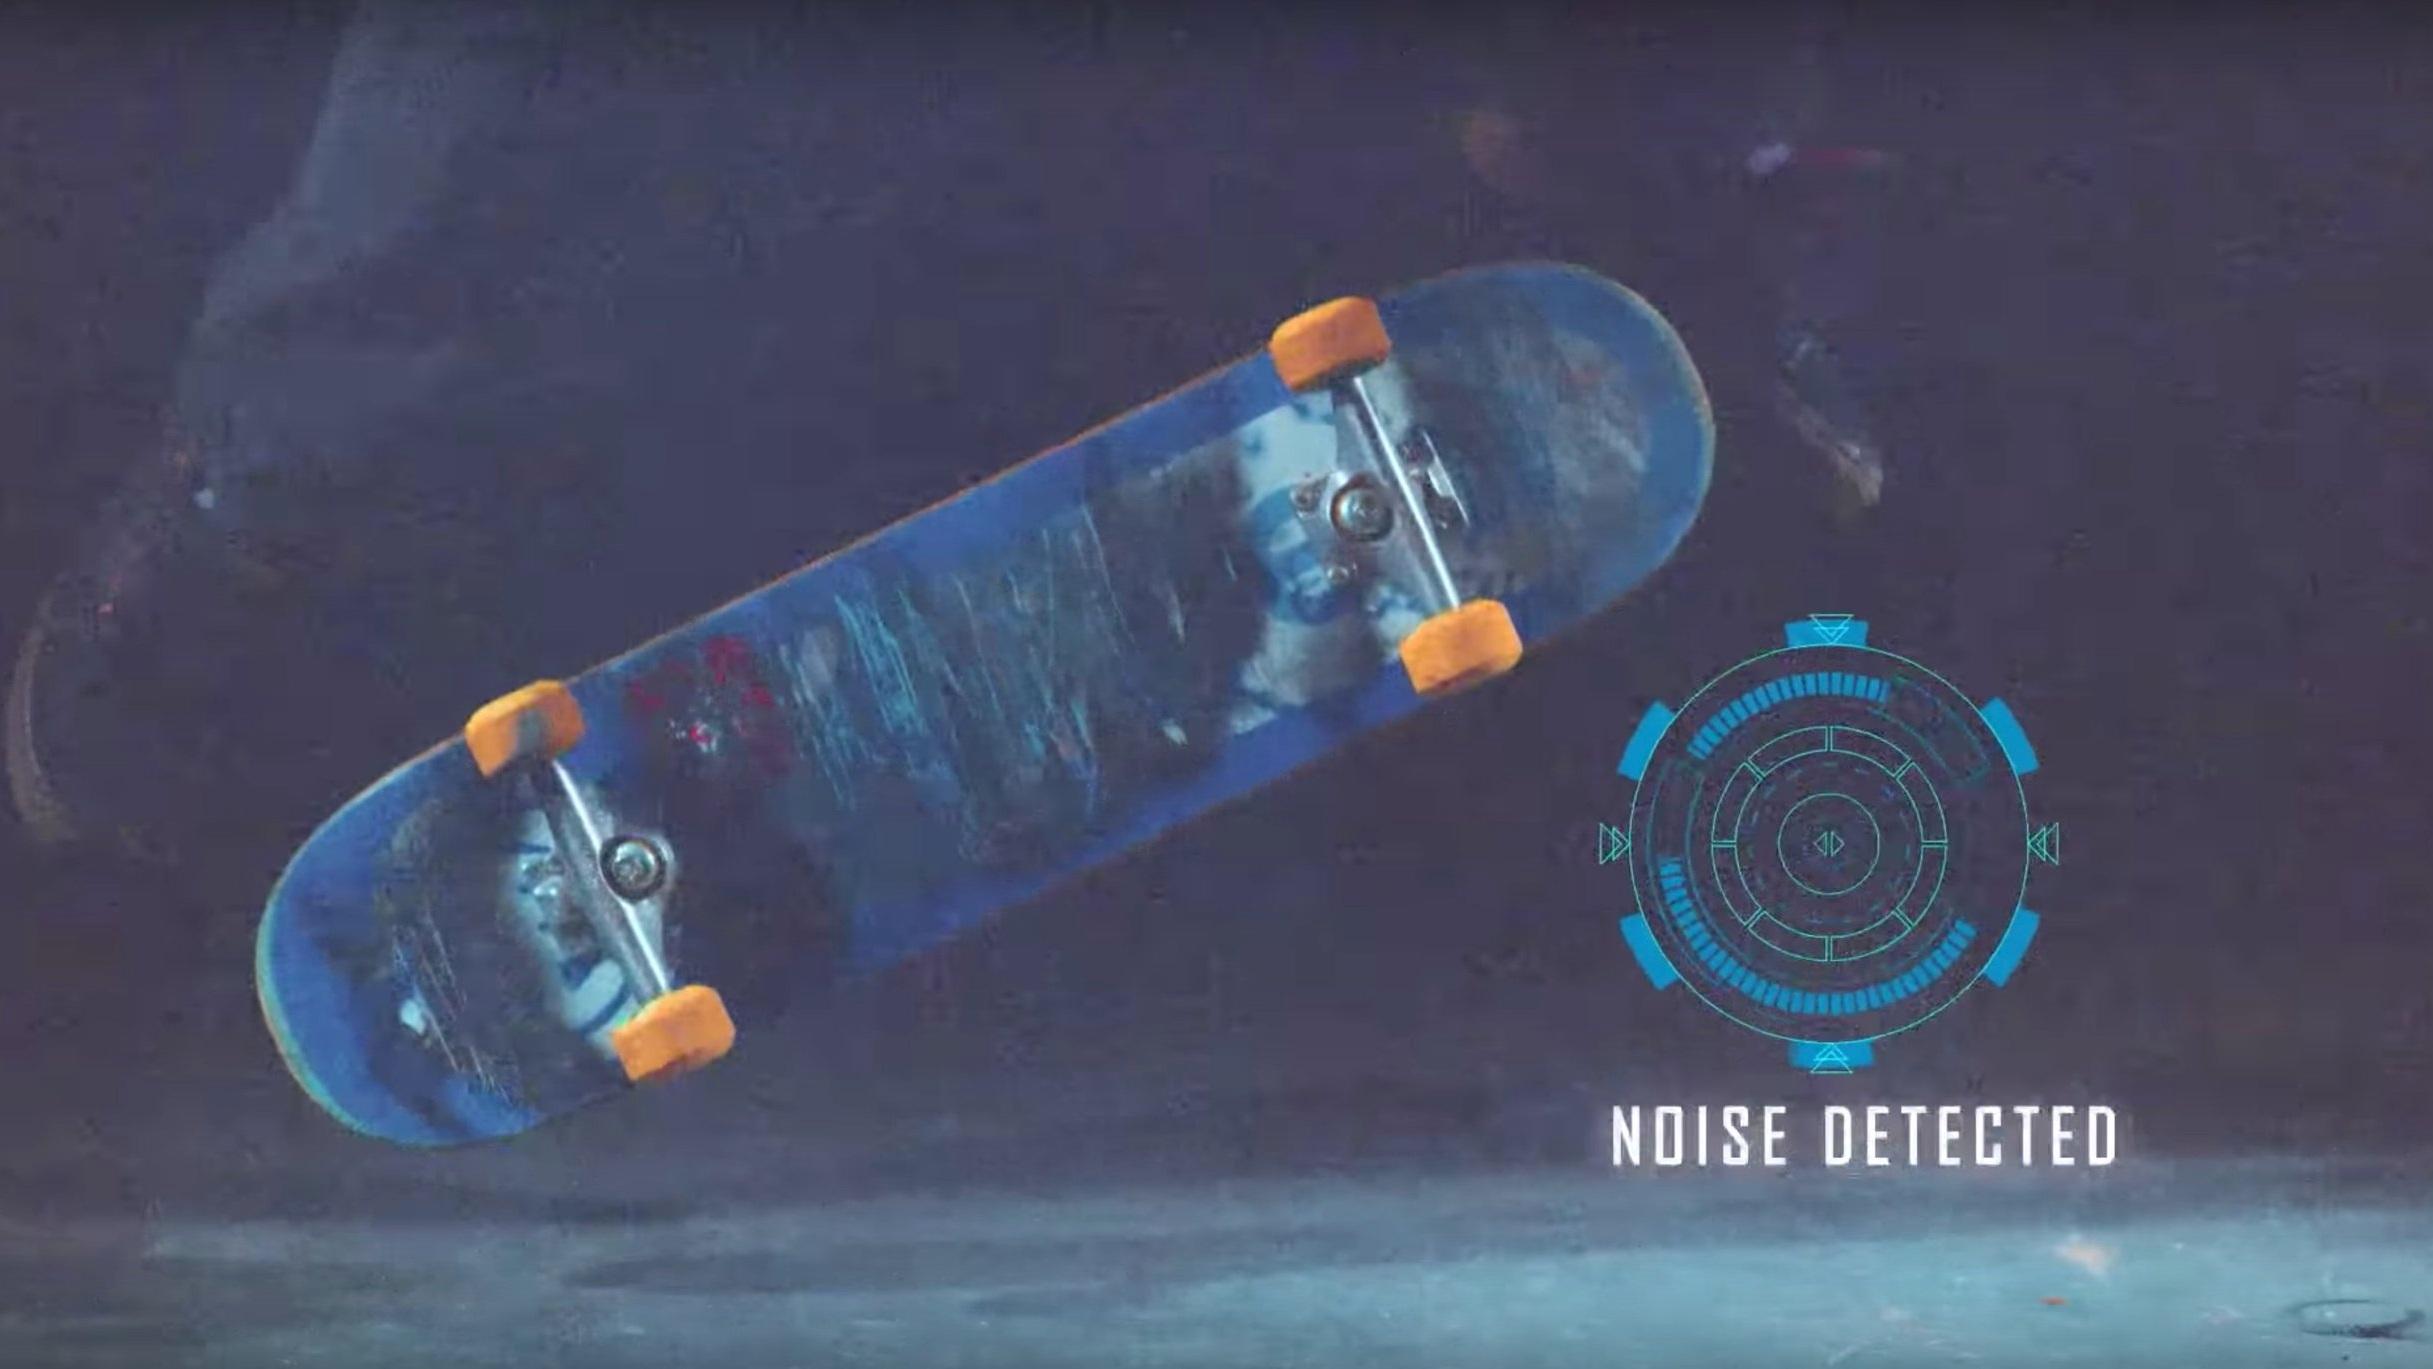 Image via Neat Video